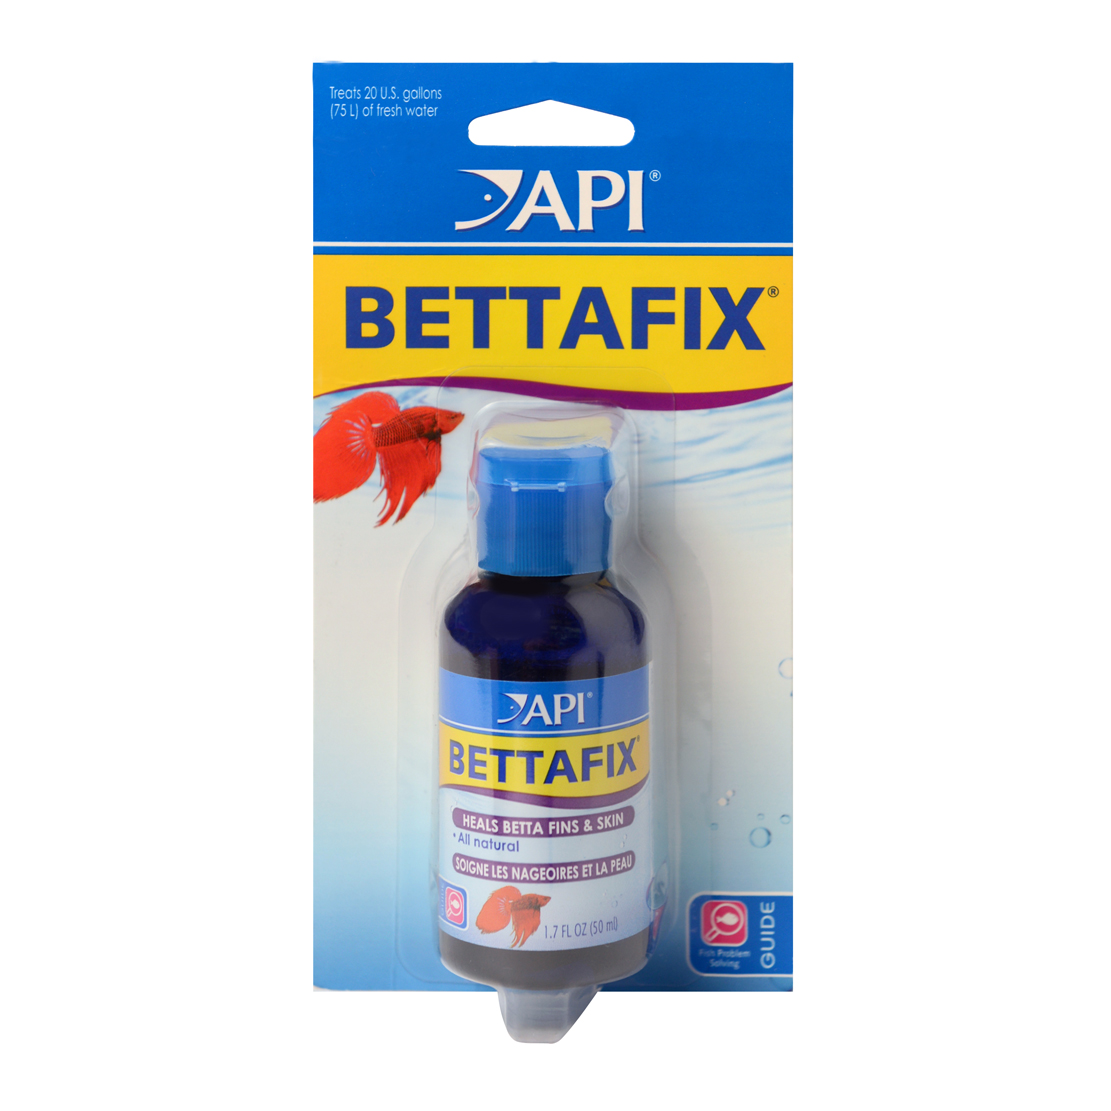 BETTAFIX™